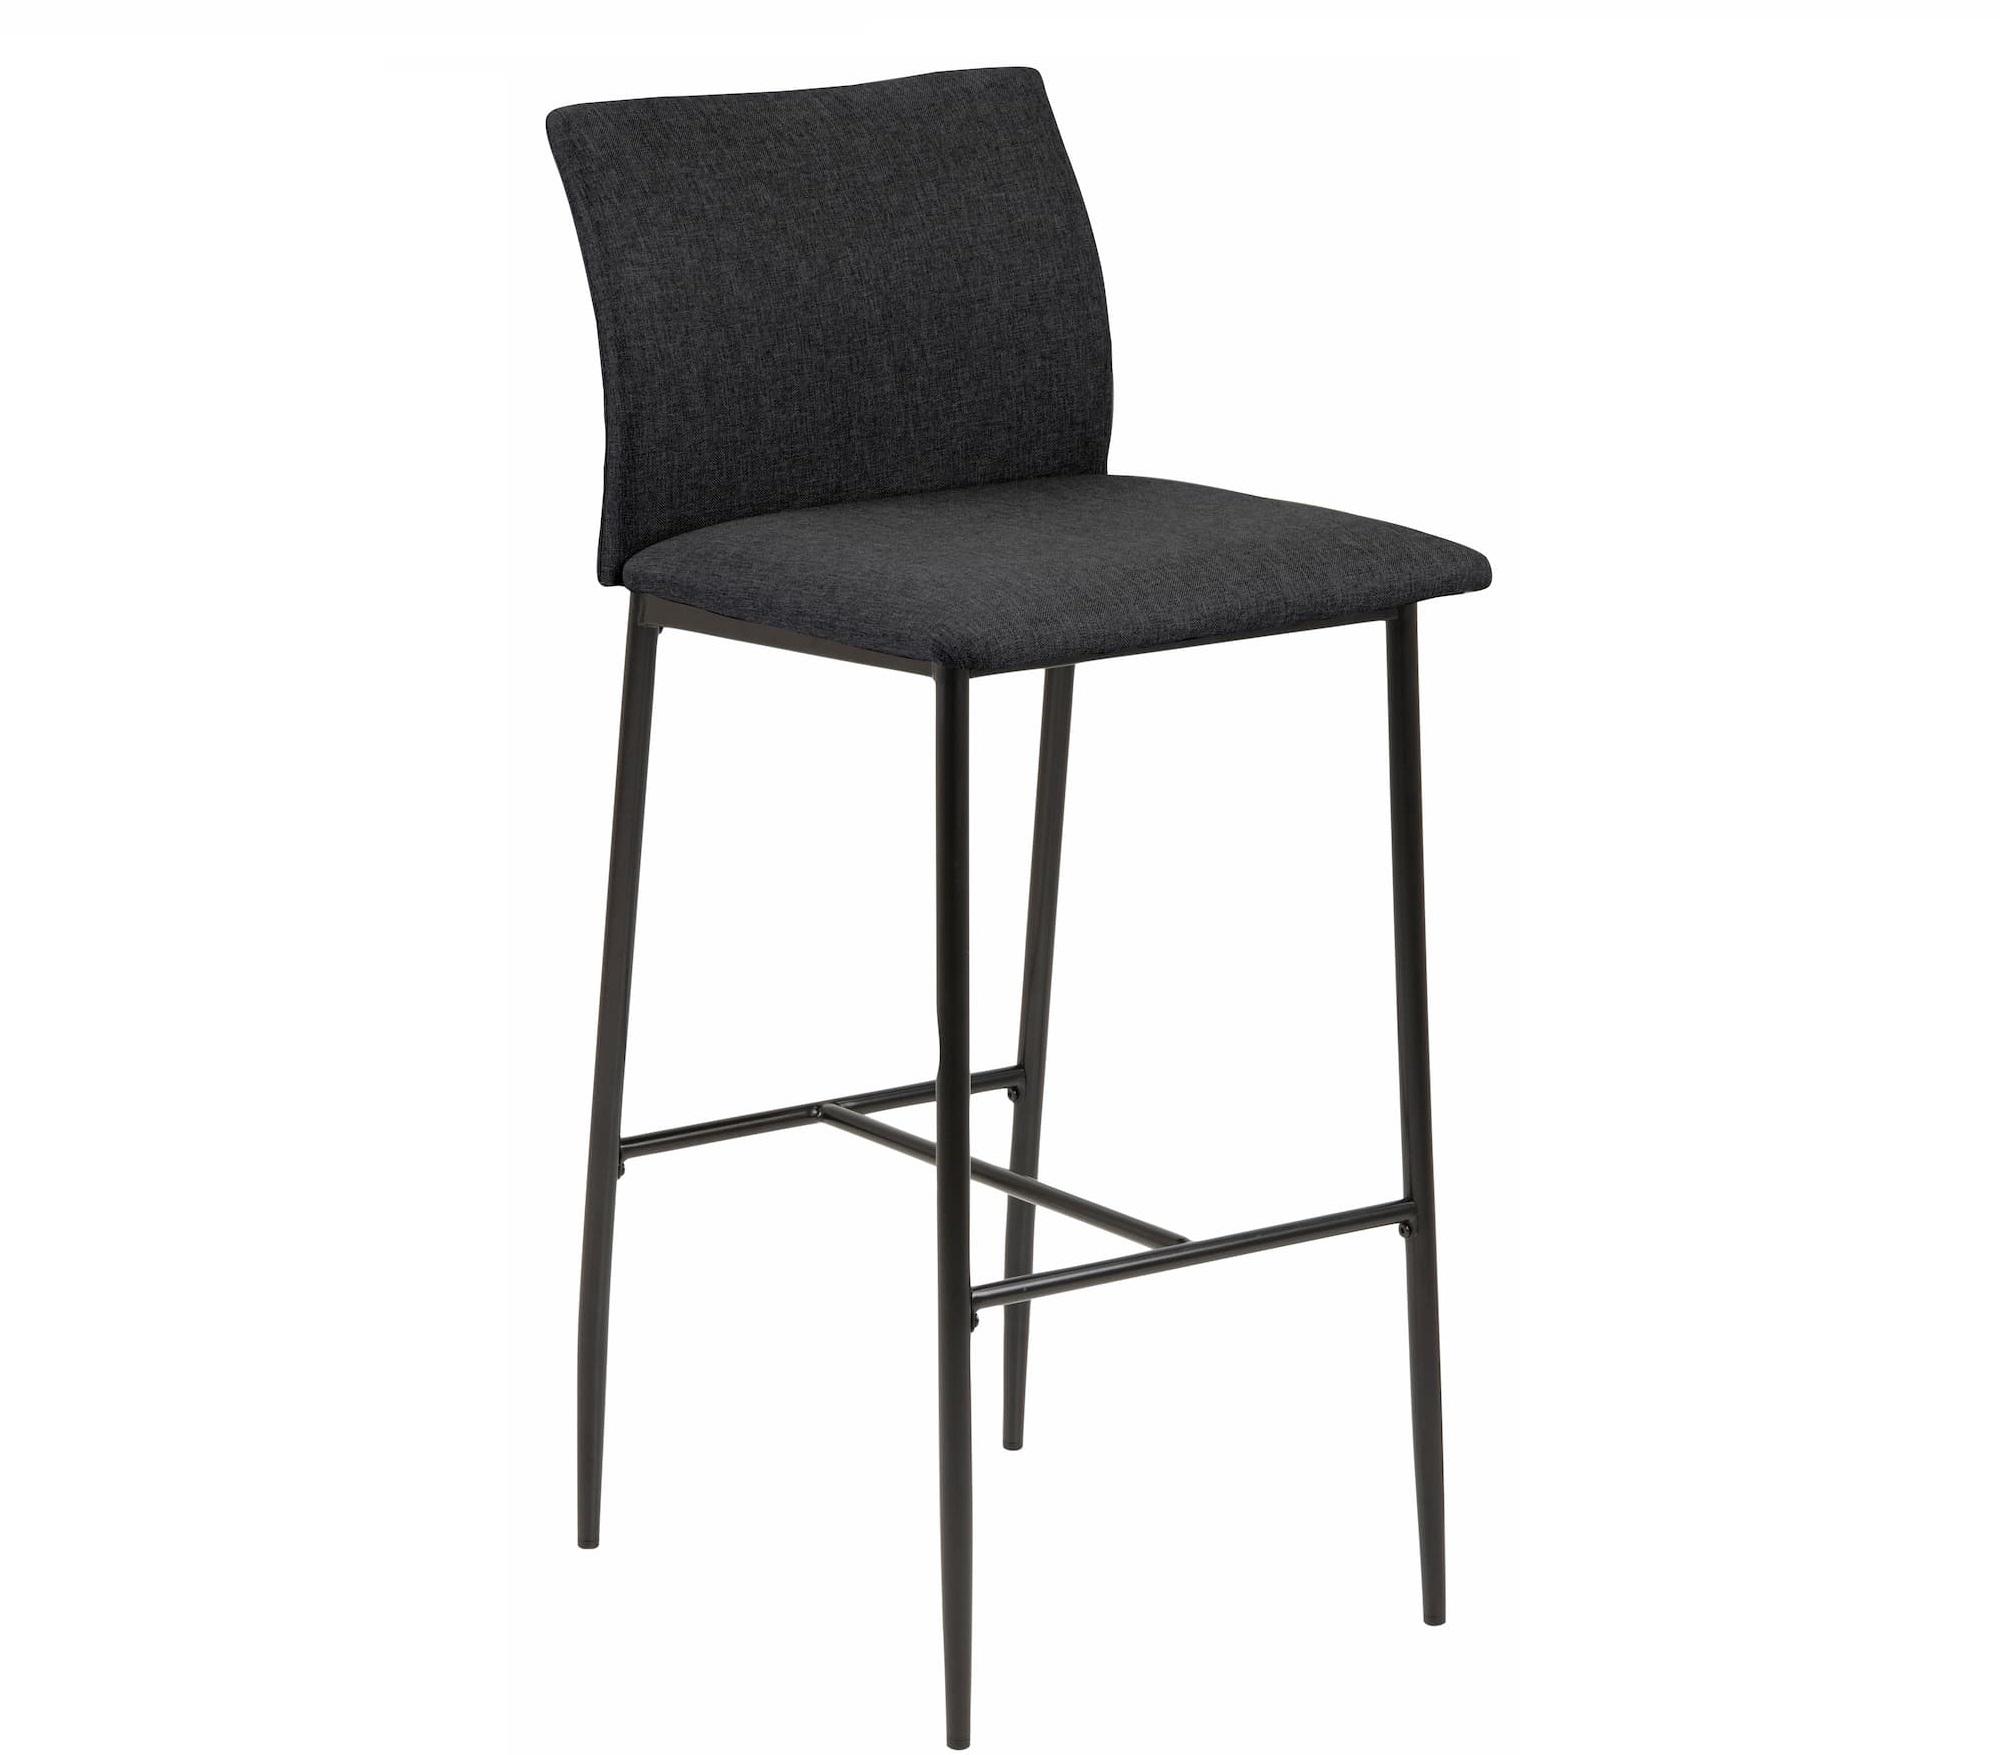 Scaun de bar tapitat cu stofa si picioare metalice Demina Gri inchis / Negru, l41,5xA50xH100,5 cm vivre.ro